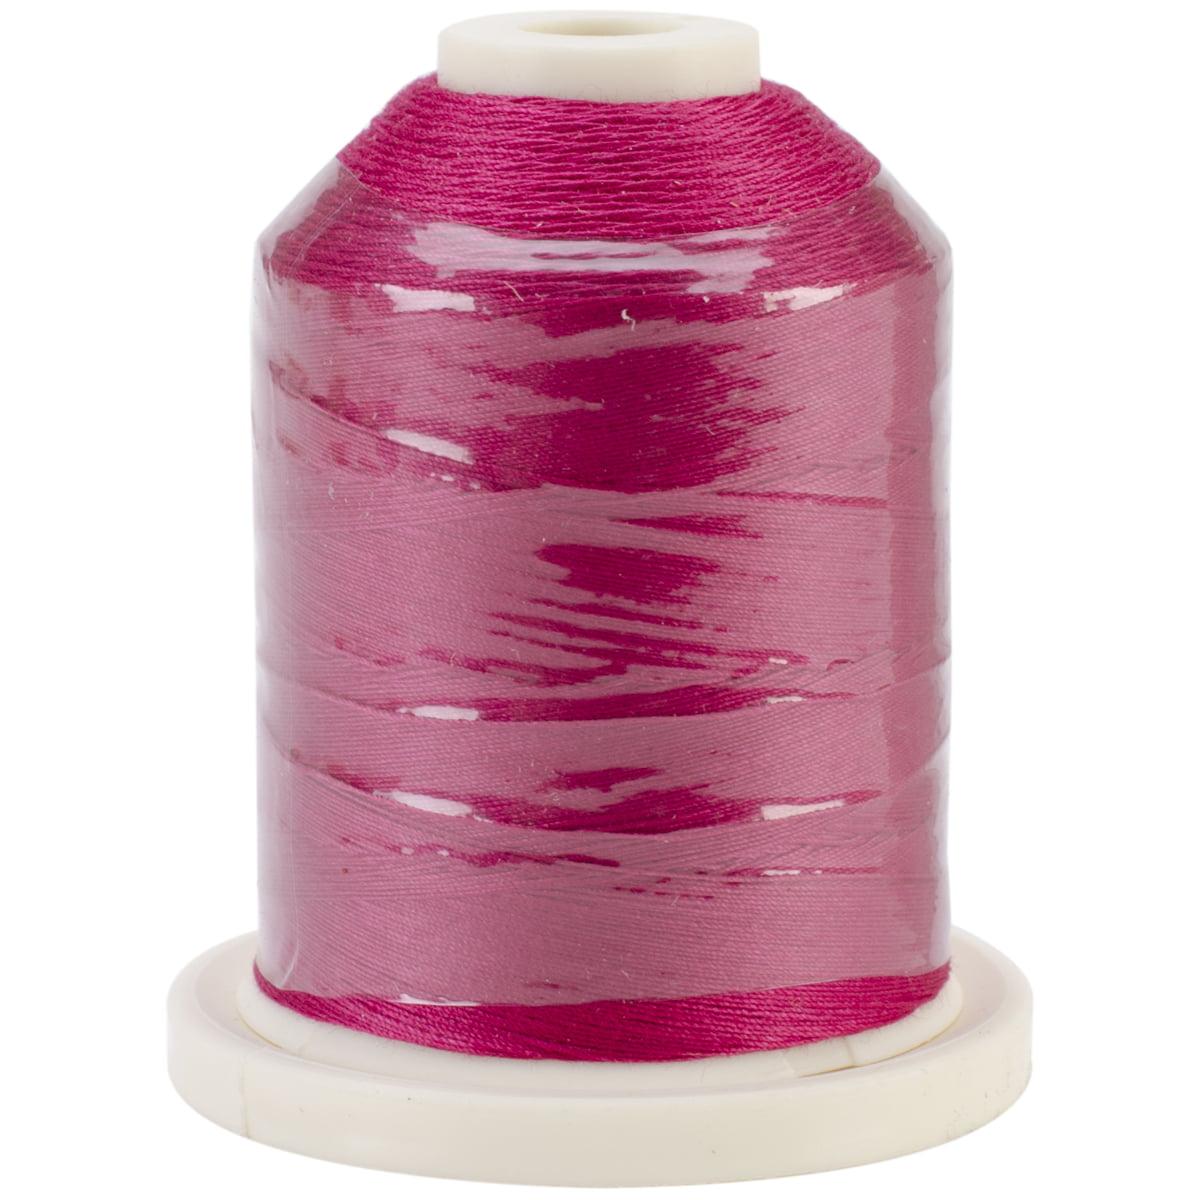 Signature 40 Cotton Solid Colors 700yd-Garnet